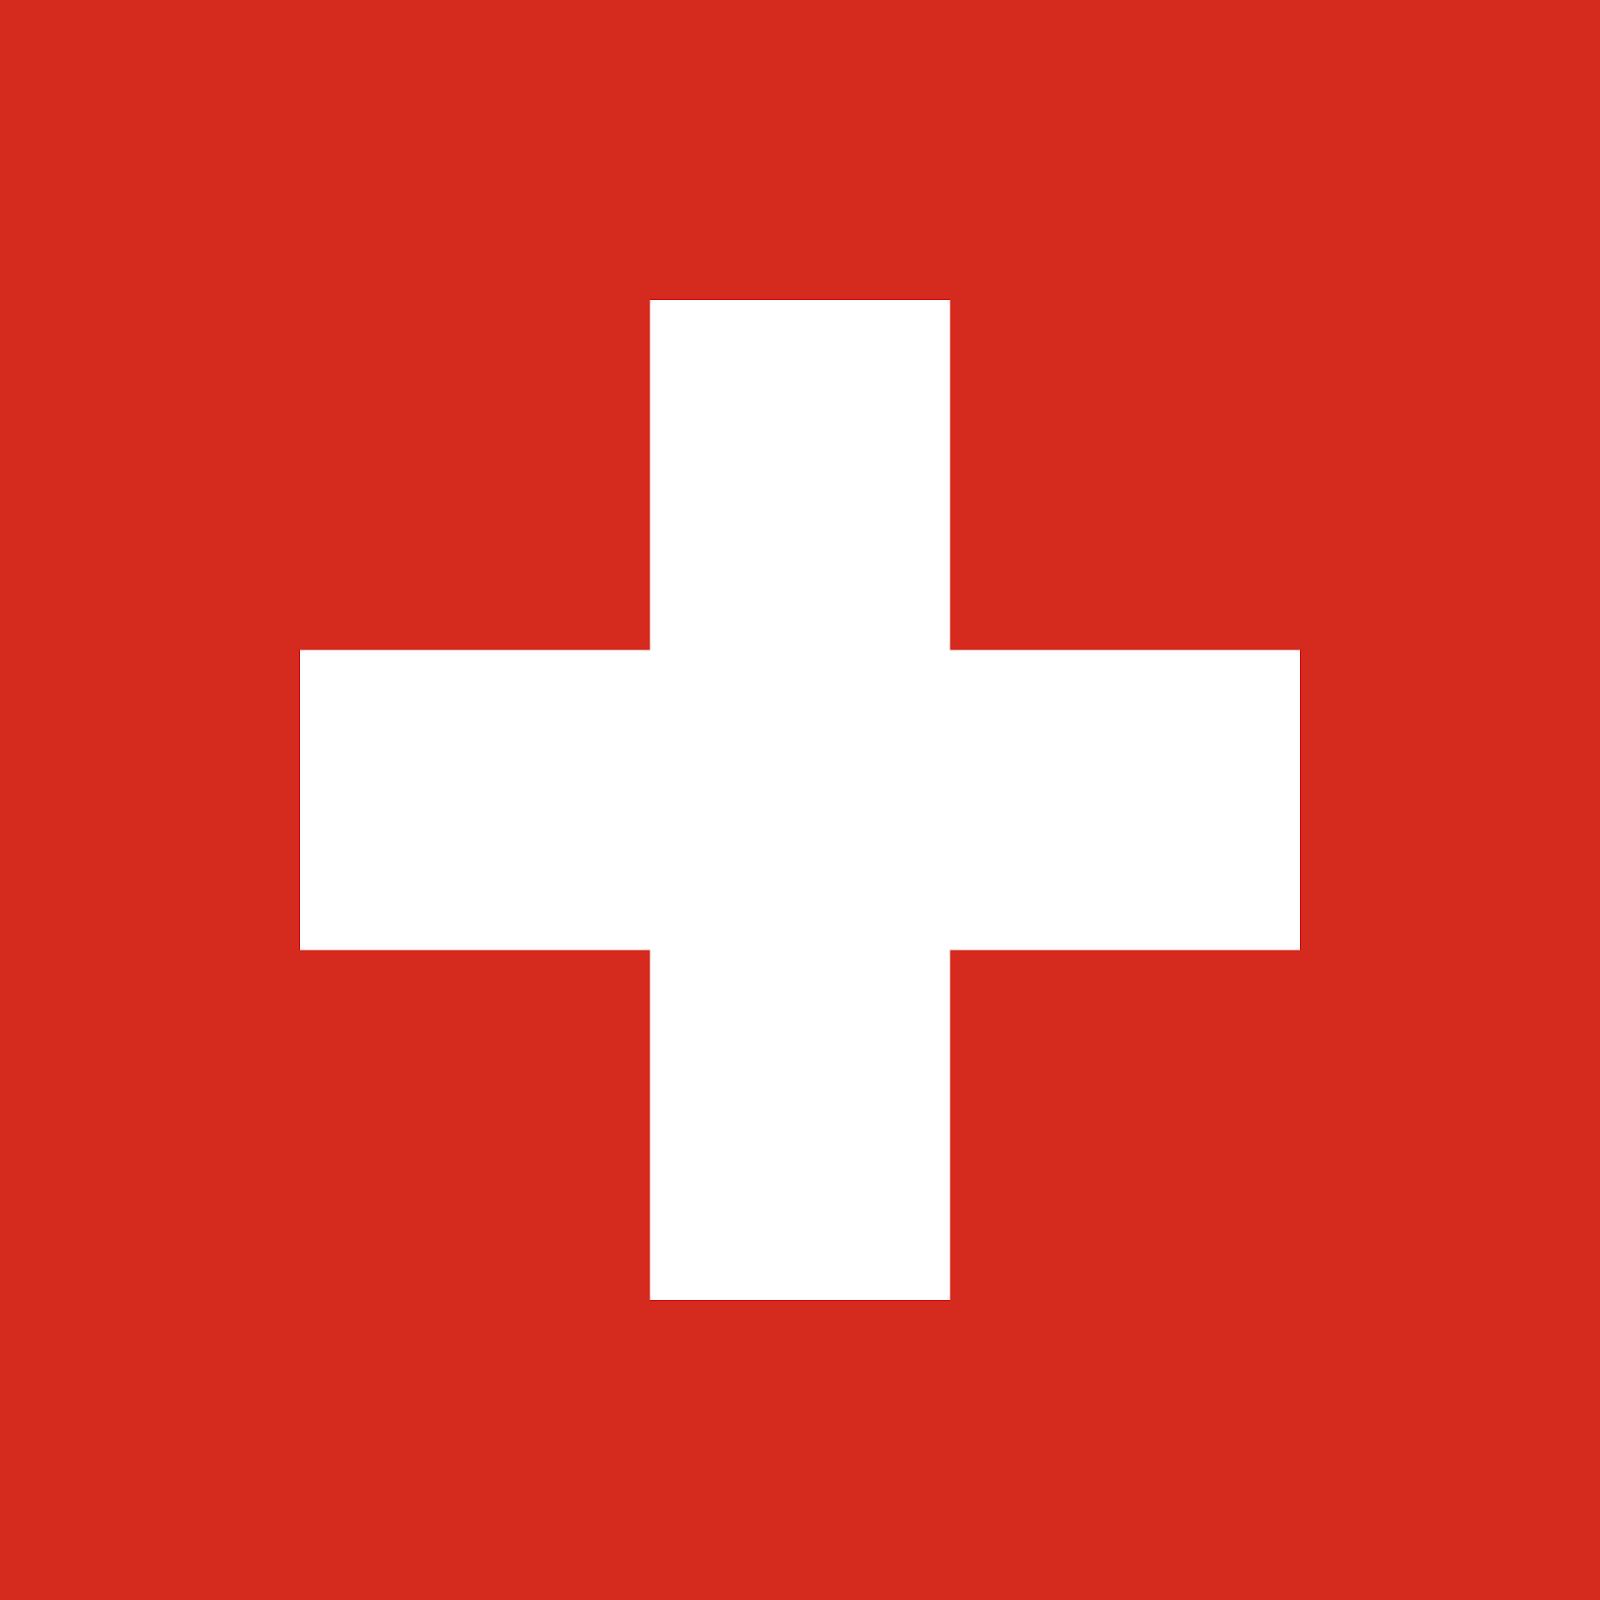 http://carbrandsincurrentproduction.blogspot.com.es/search/label/Switzerland